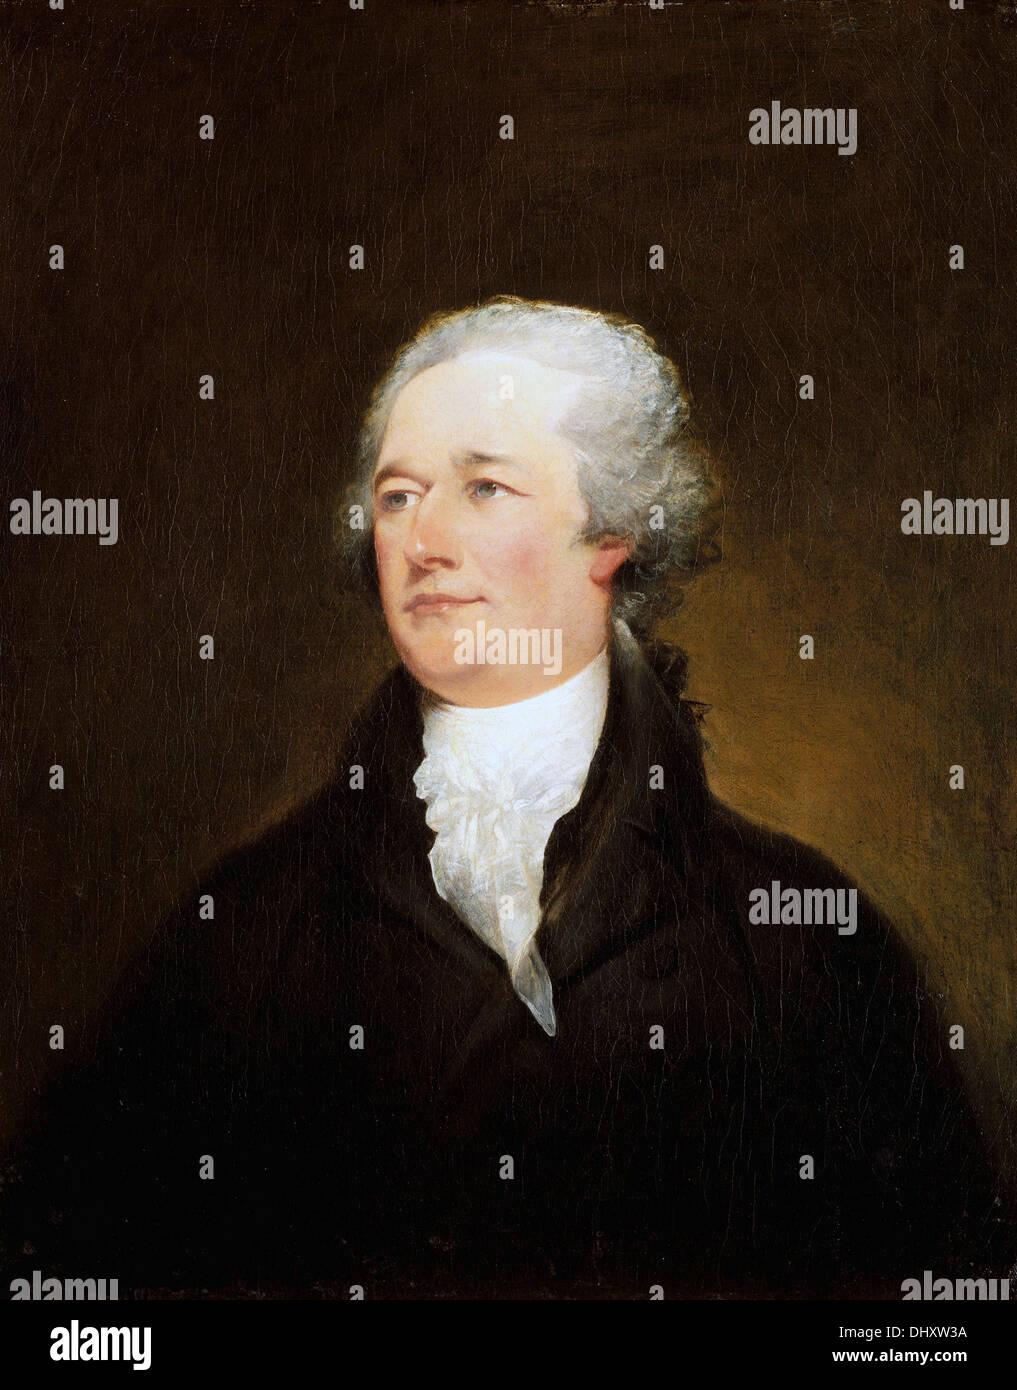 Alexander Hamilton - par John Trumbull, 1806 Photo Stock